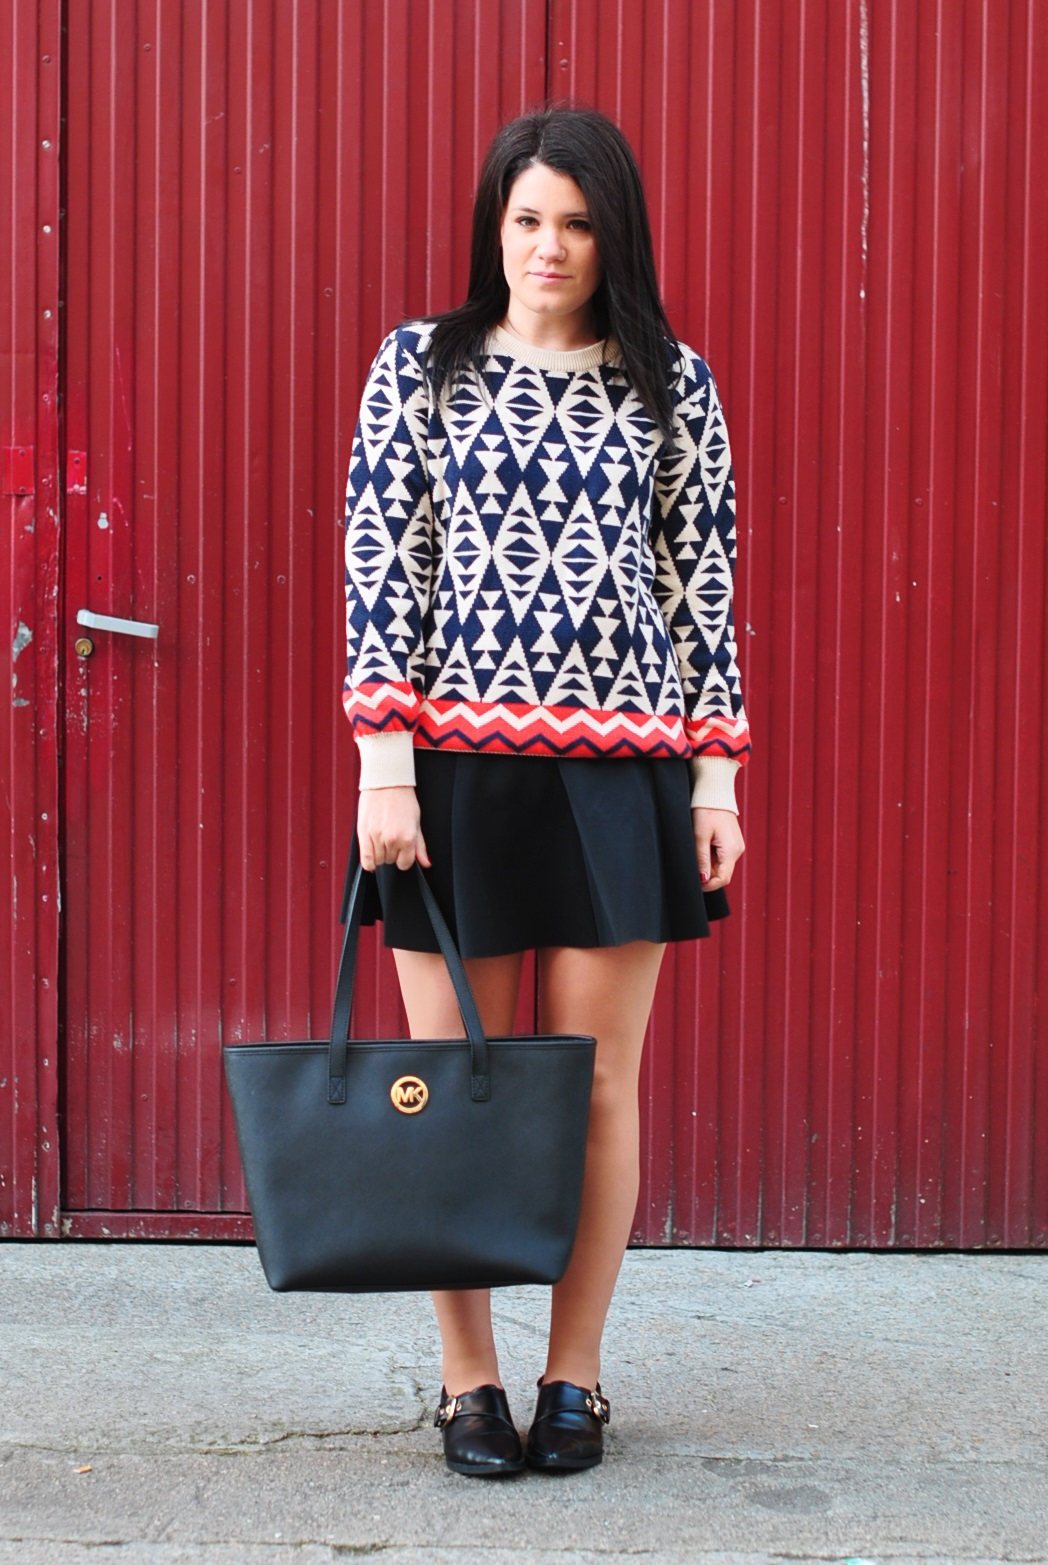 20151202-pepaloves-sweater-03